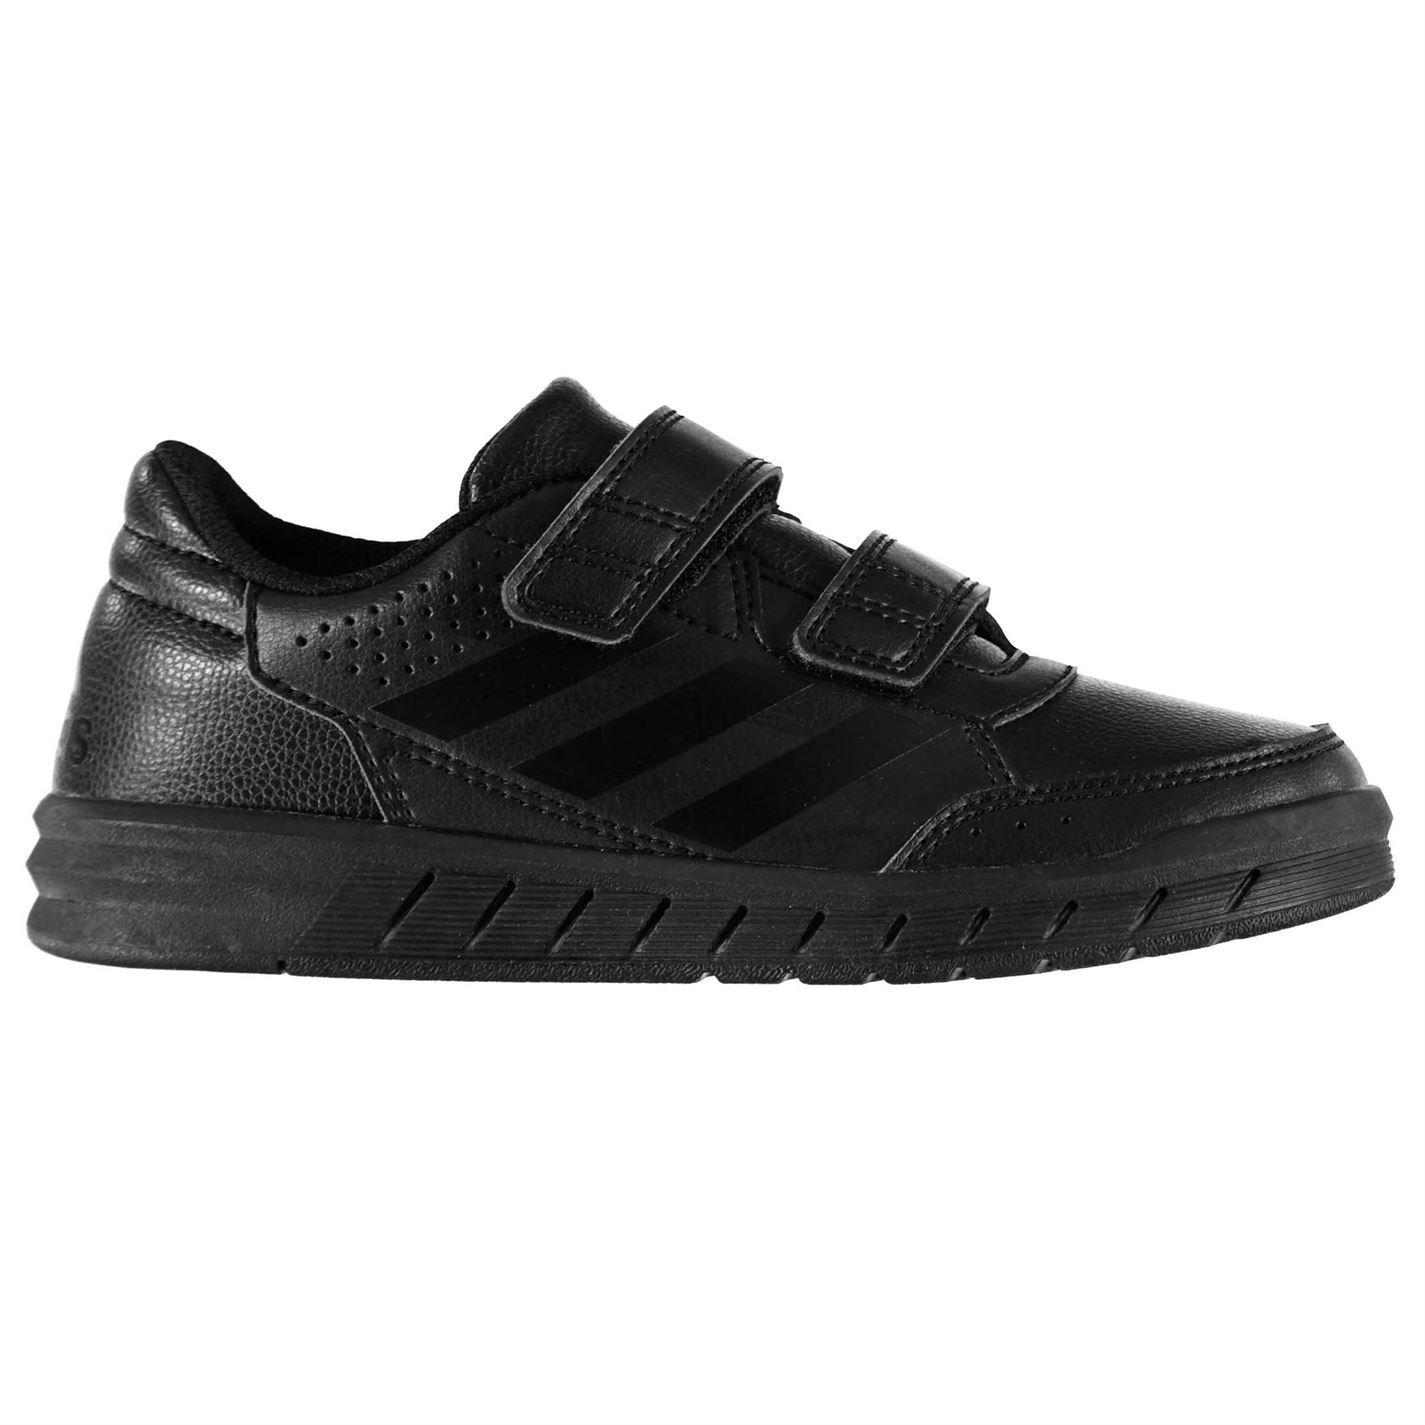 miniatura 6 - ADIDAS-alta-Sport-CF-Scarpe-da-ginnastica-bambino-ragazzo-calzature